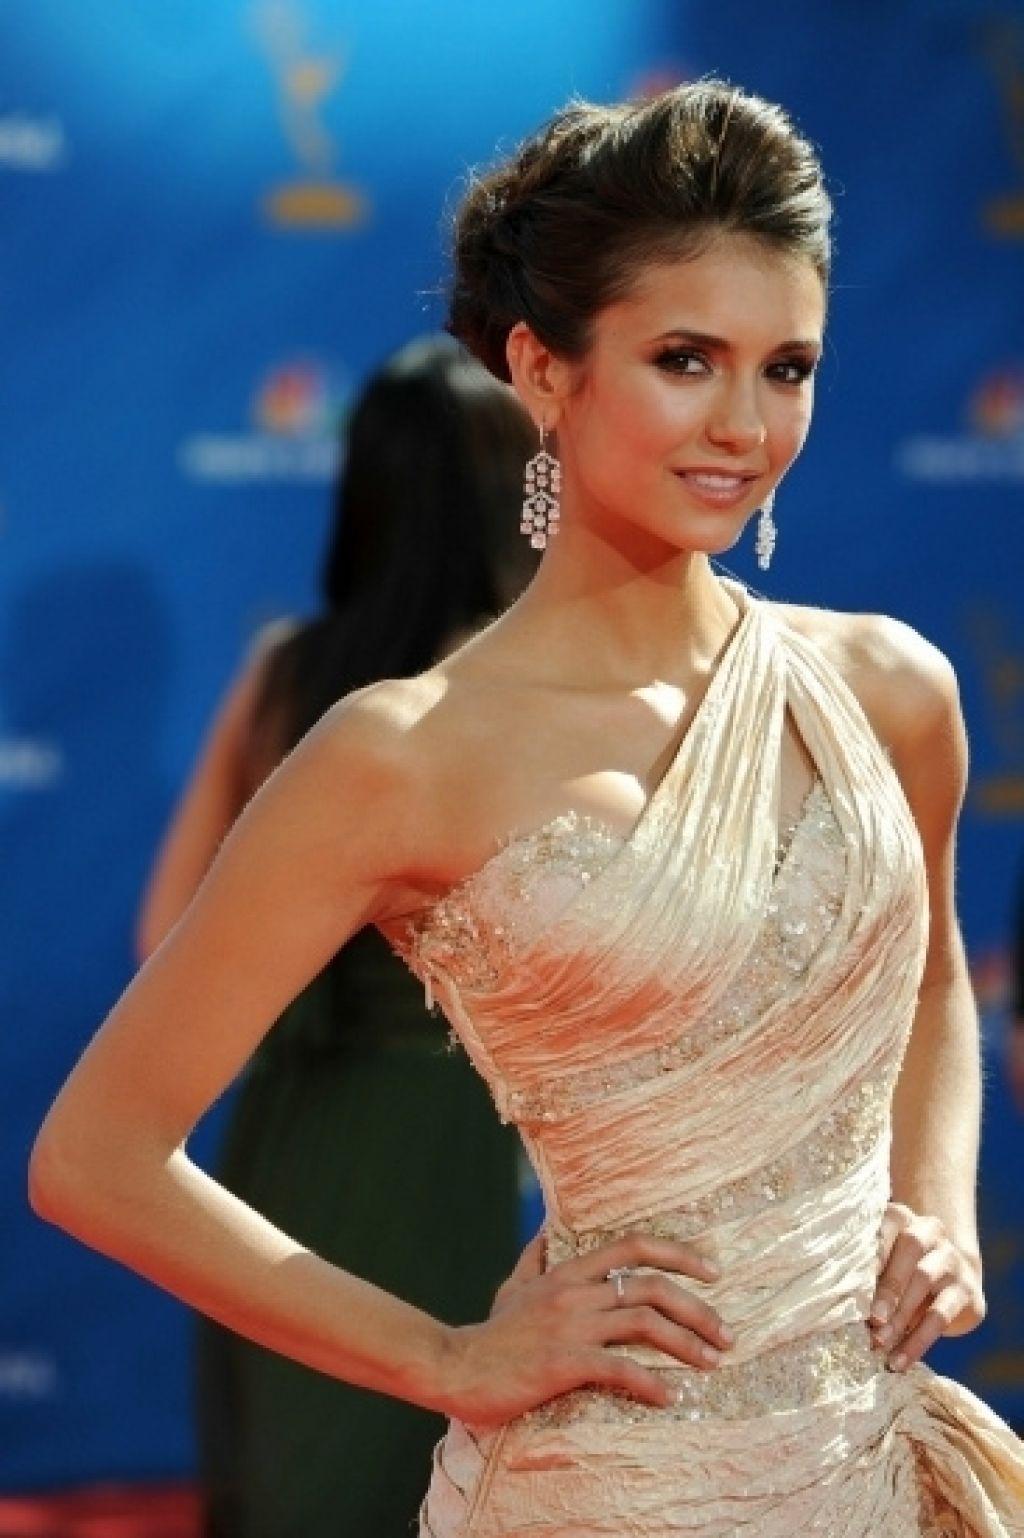 nina dobrev1 Gorgeous Nina Dobrev   Canadian Actress and Model